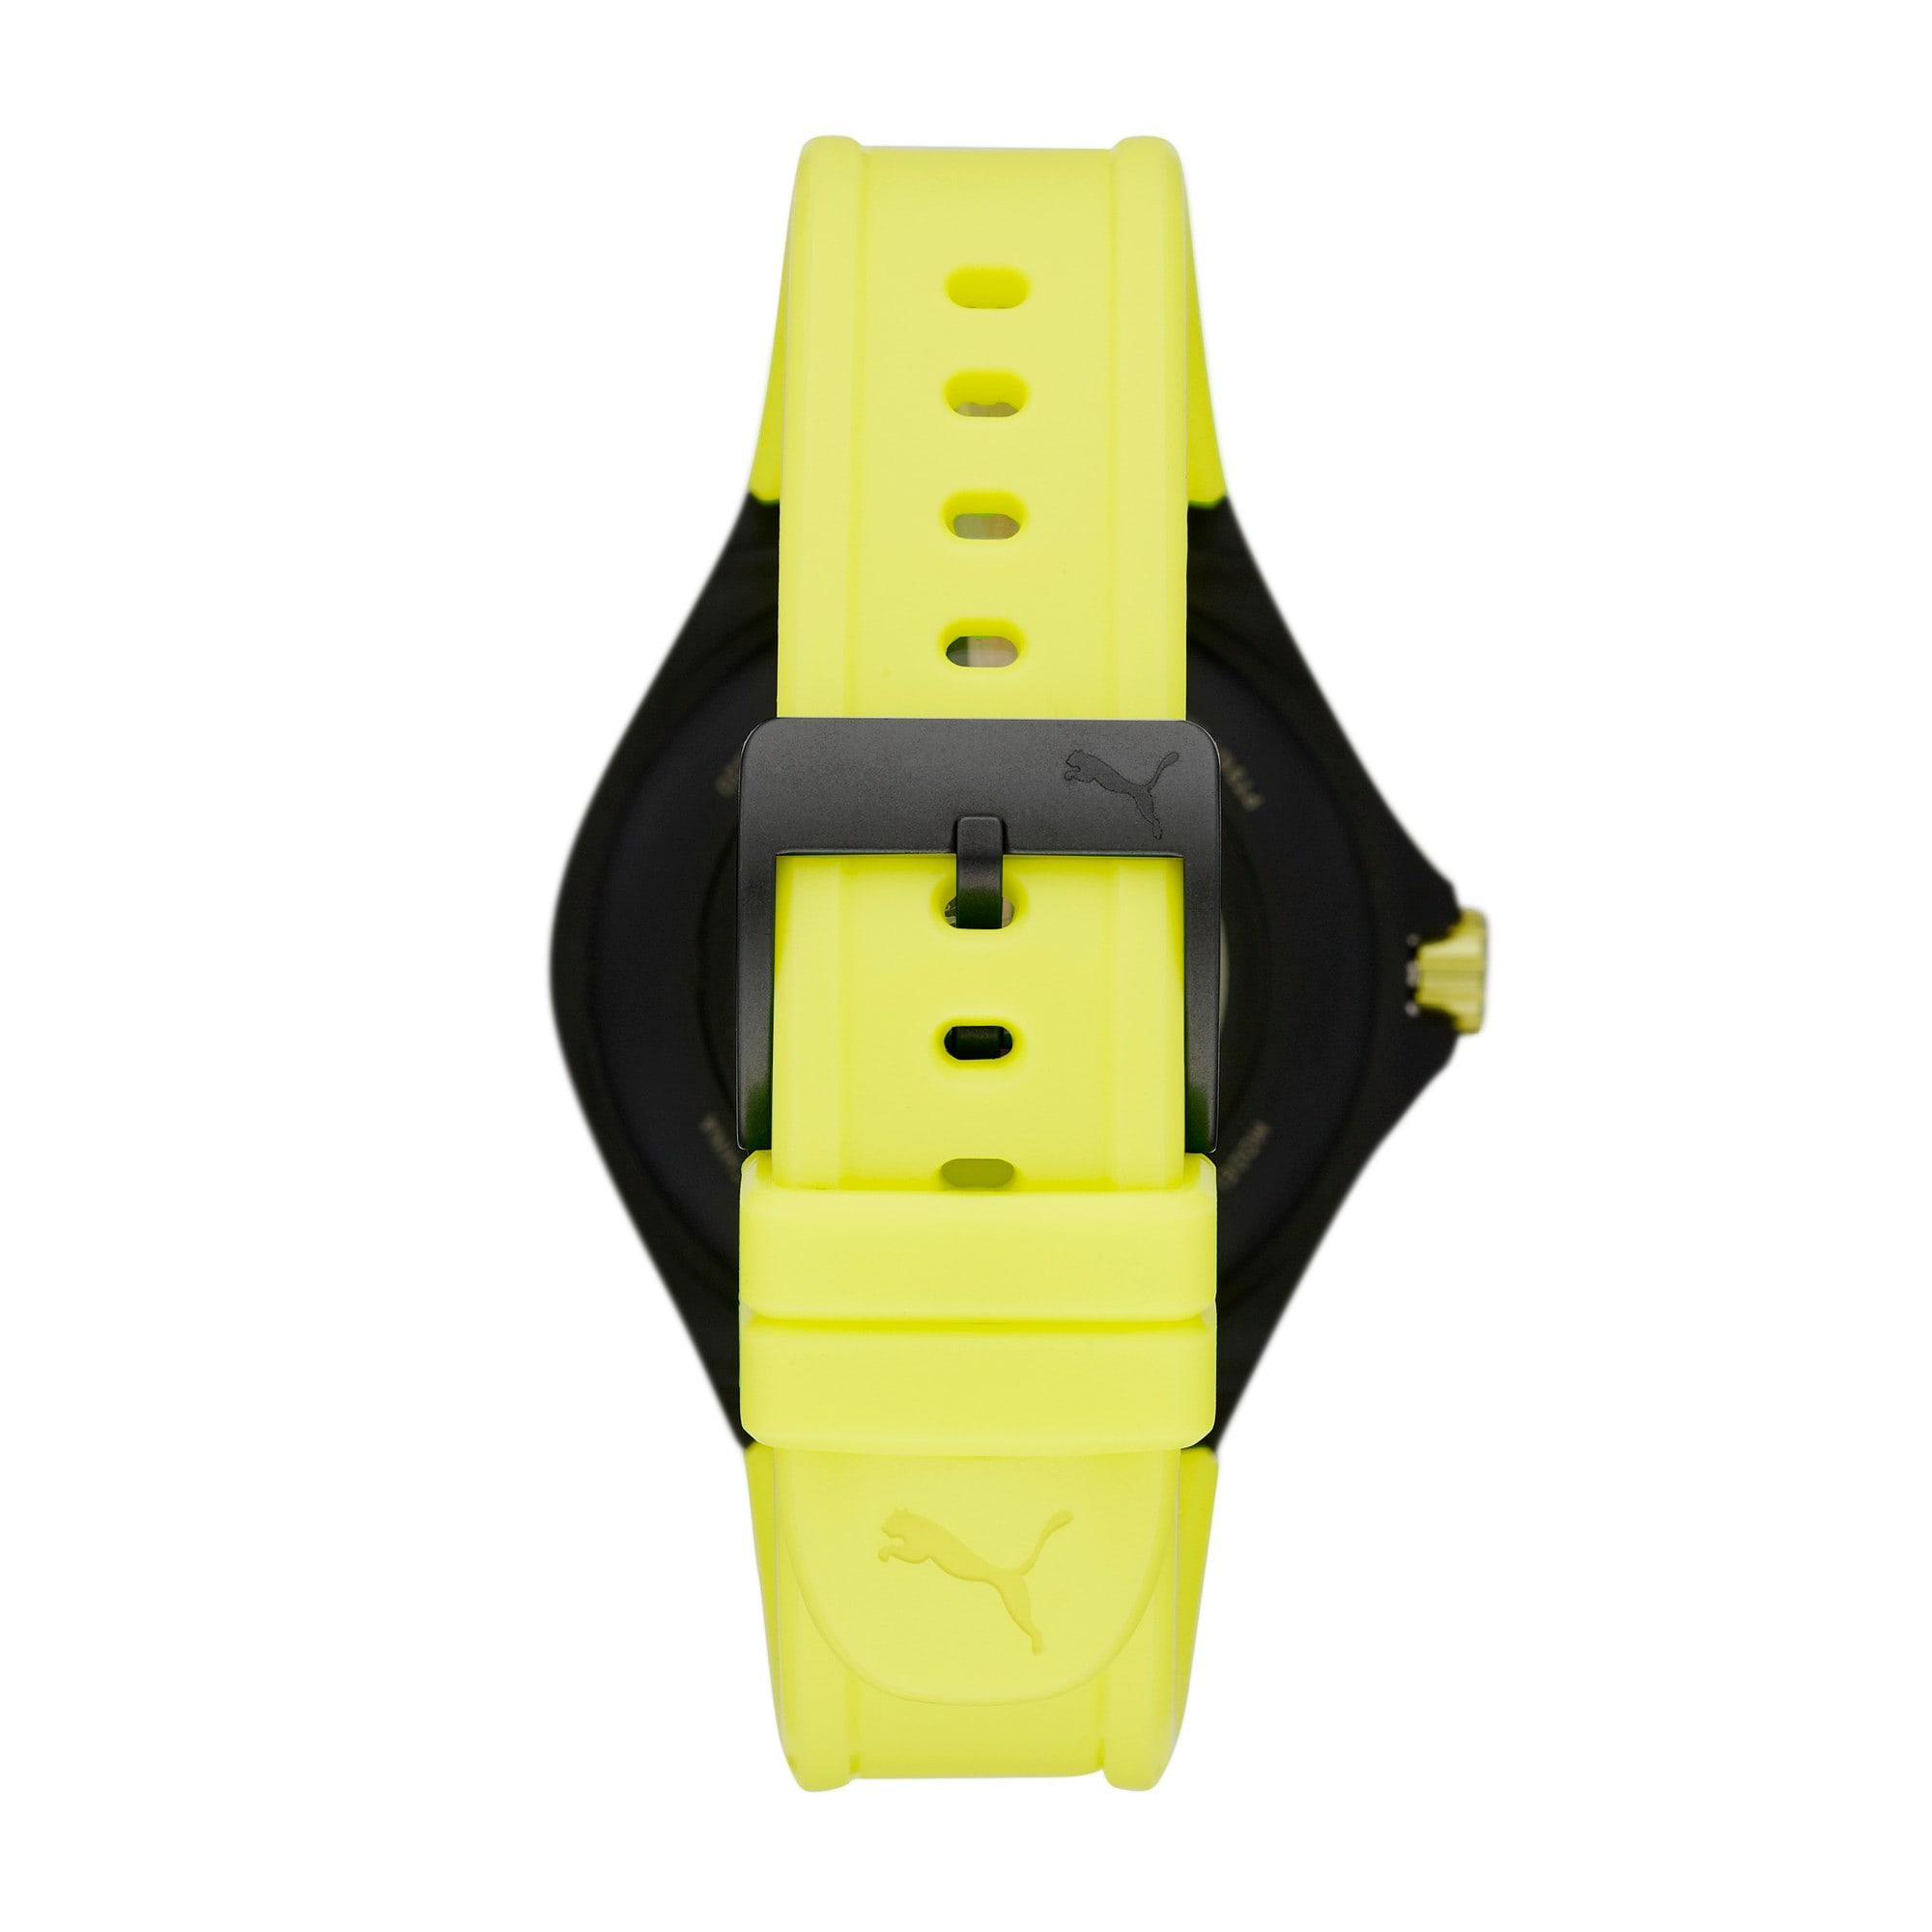 Thumbnail 3 of PUMA Smartwatch, Yellow/Black, medium